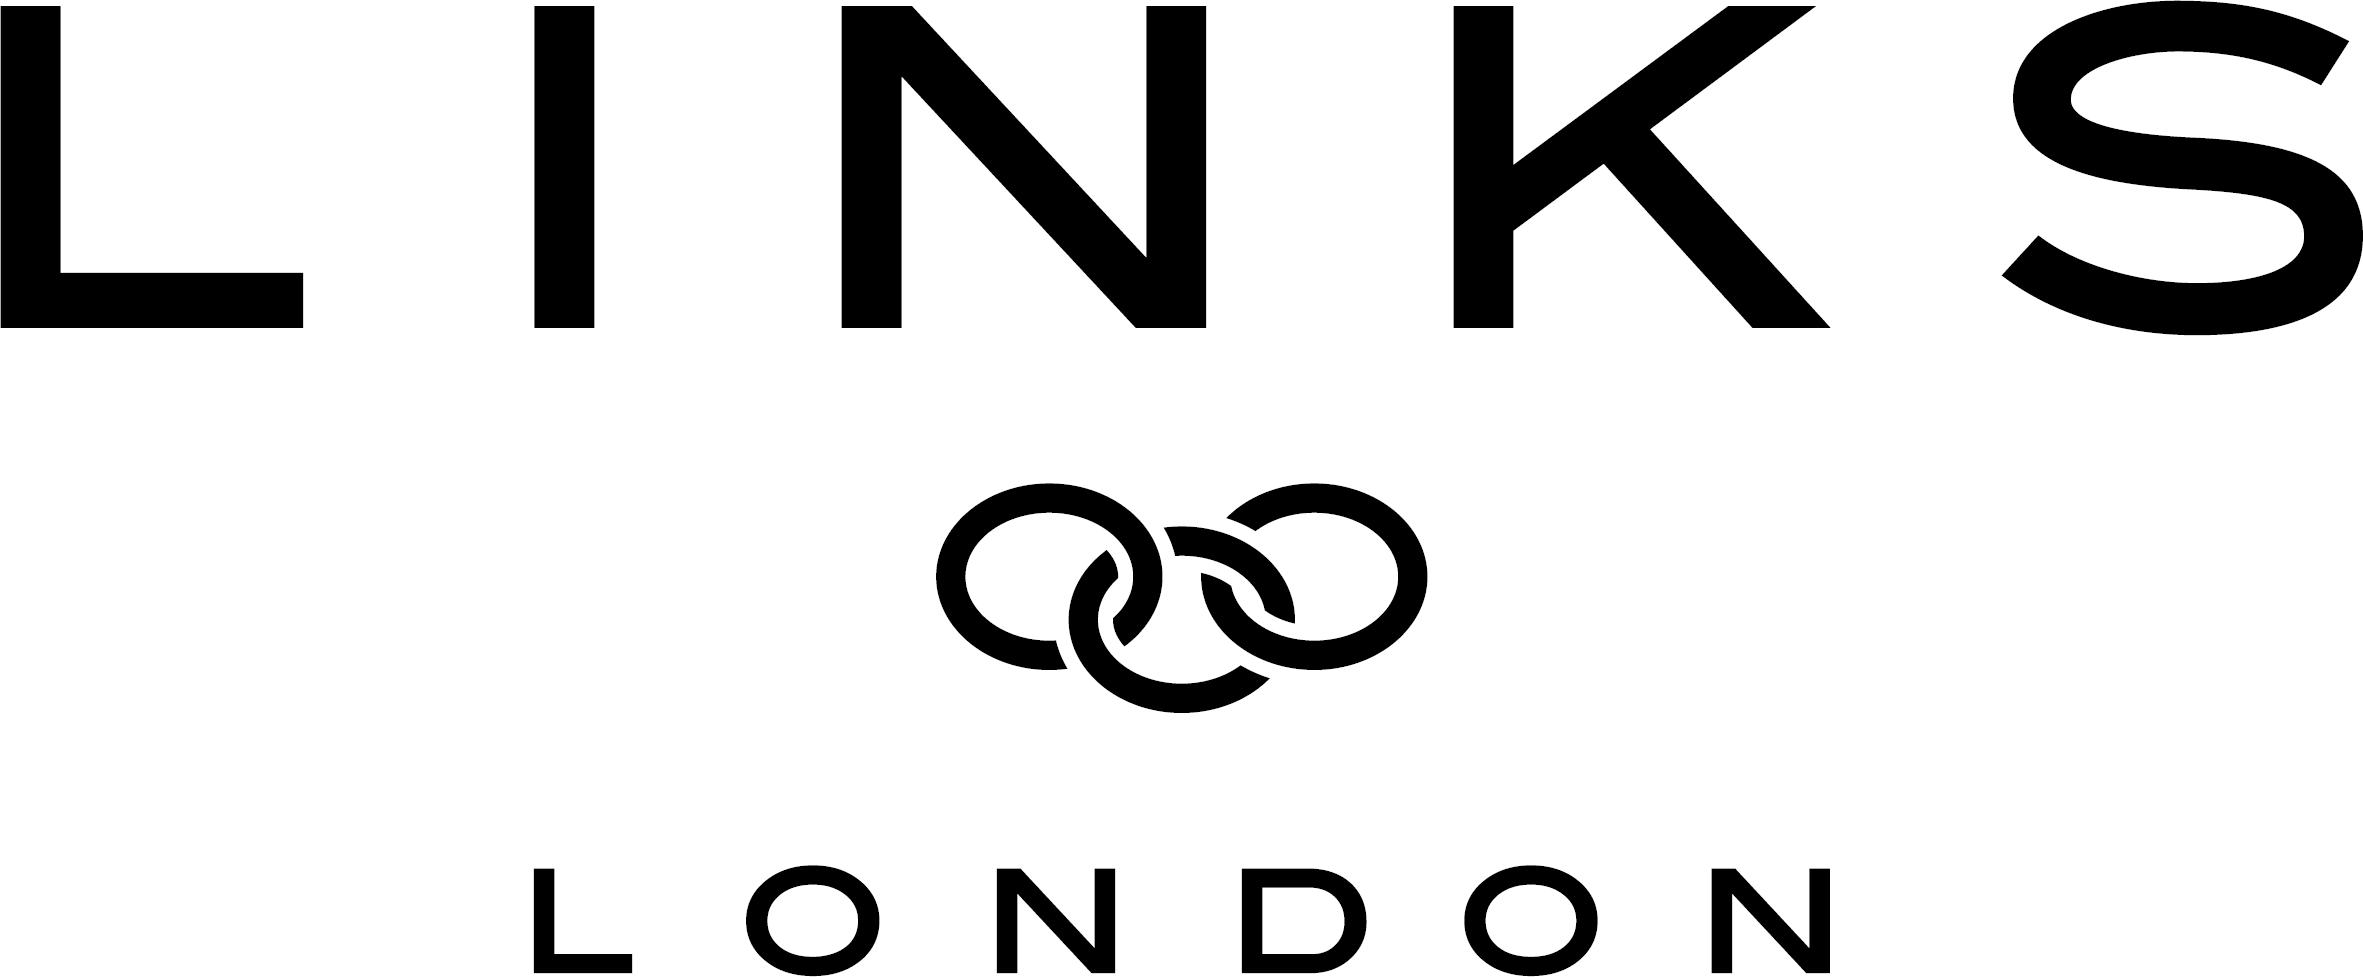 lol-logo-black.png